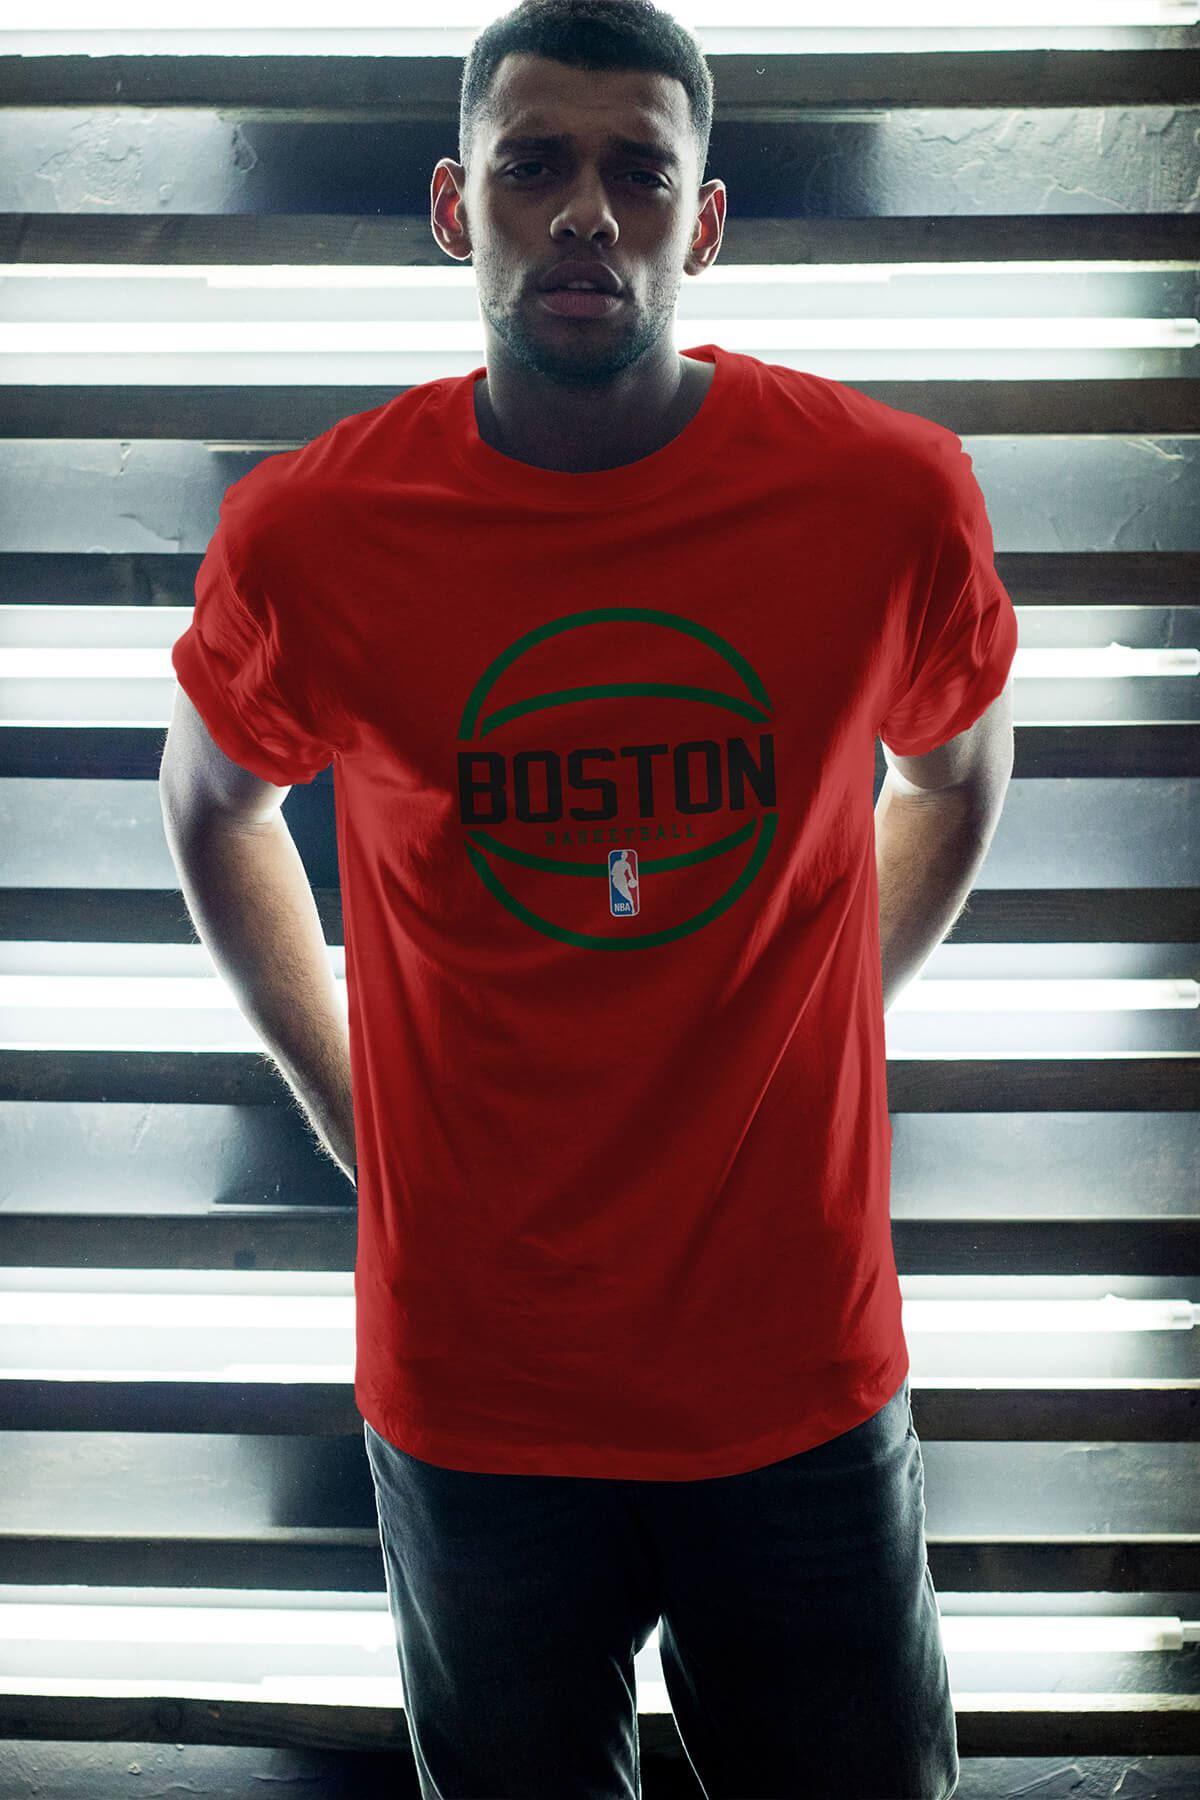 Boston Celtics 30 Kırmızı Erkek Oversize Tshirt - Tişört